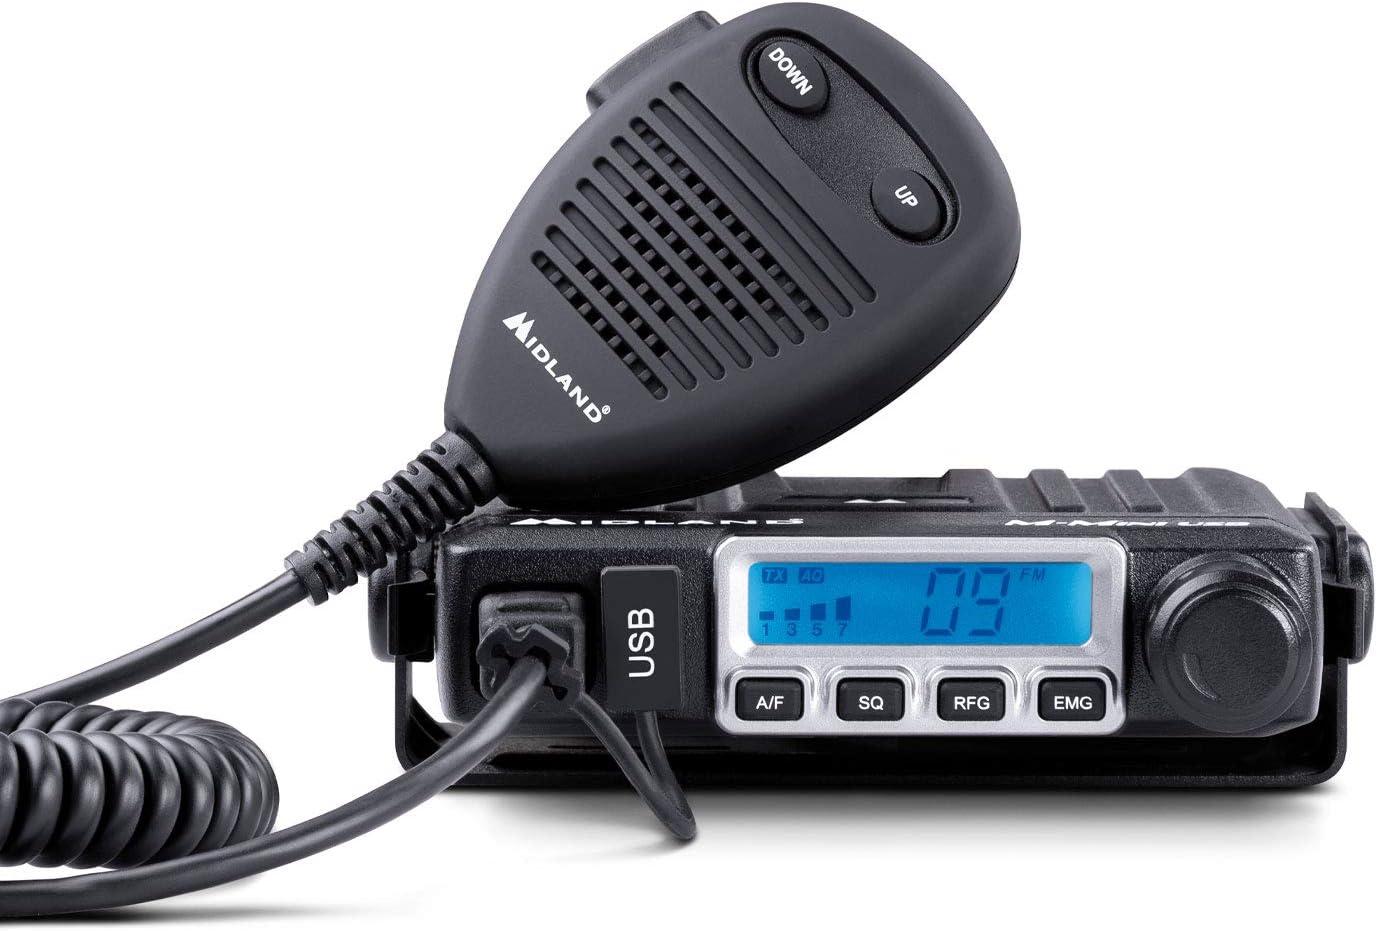 Kit Midland Cb Go Usb Cb Radio M Mini Usb Midland Lc29 Antenne Navigation